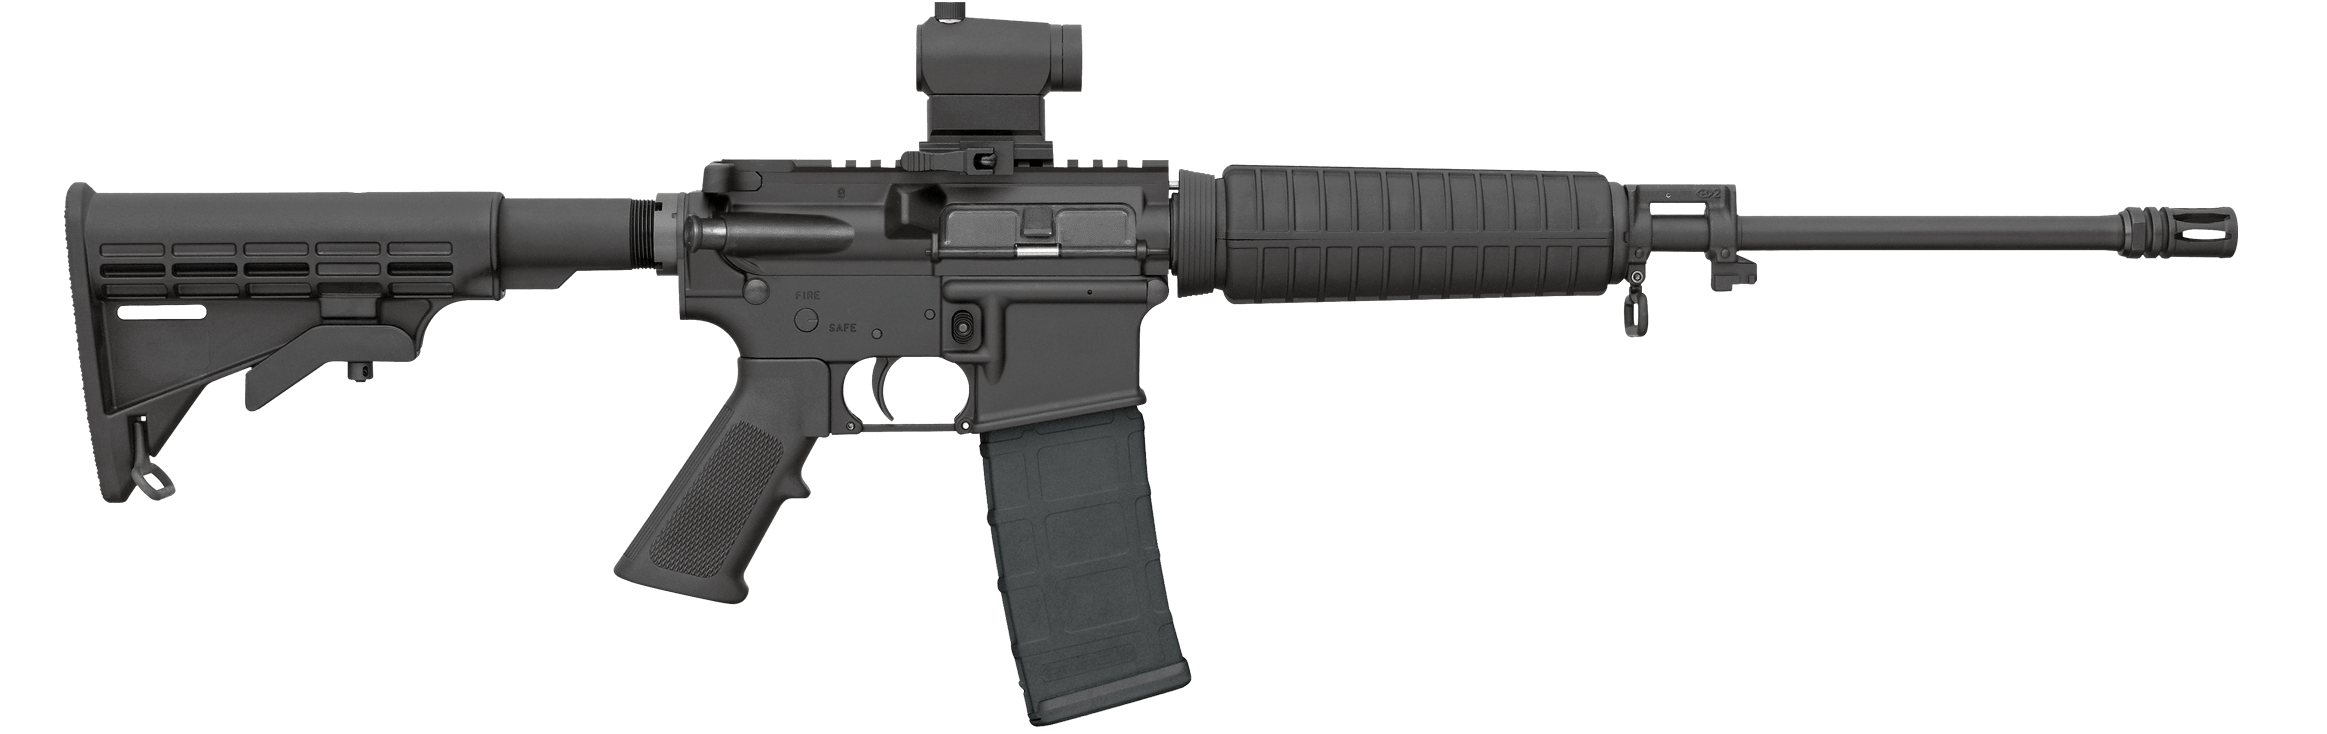 Clipart gun shotgun. Bushmaster xm qrc w